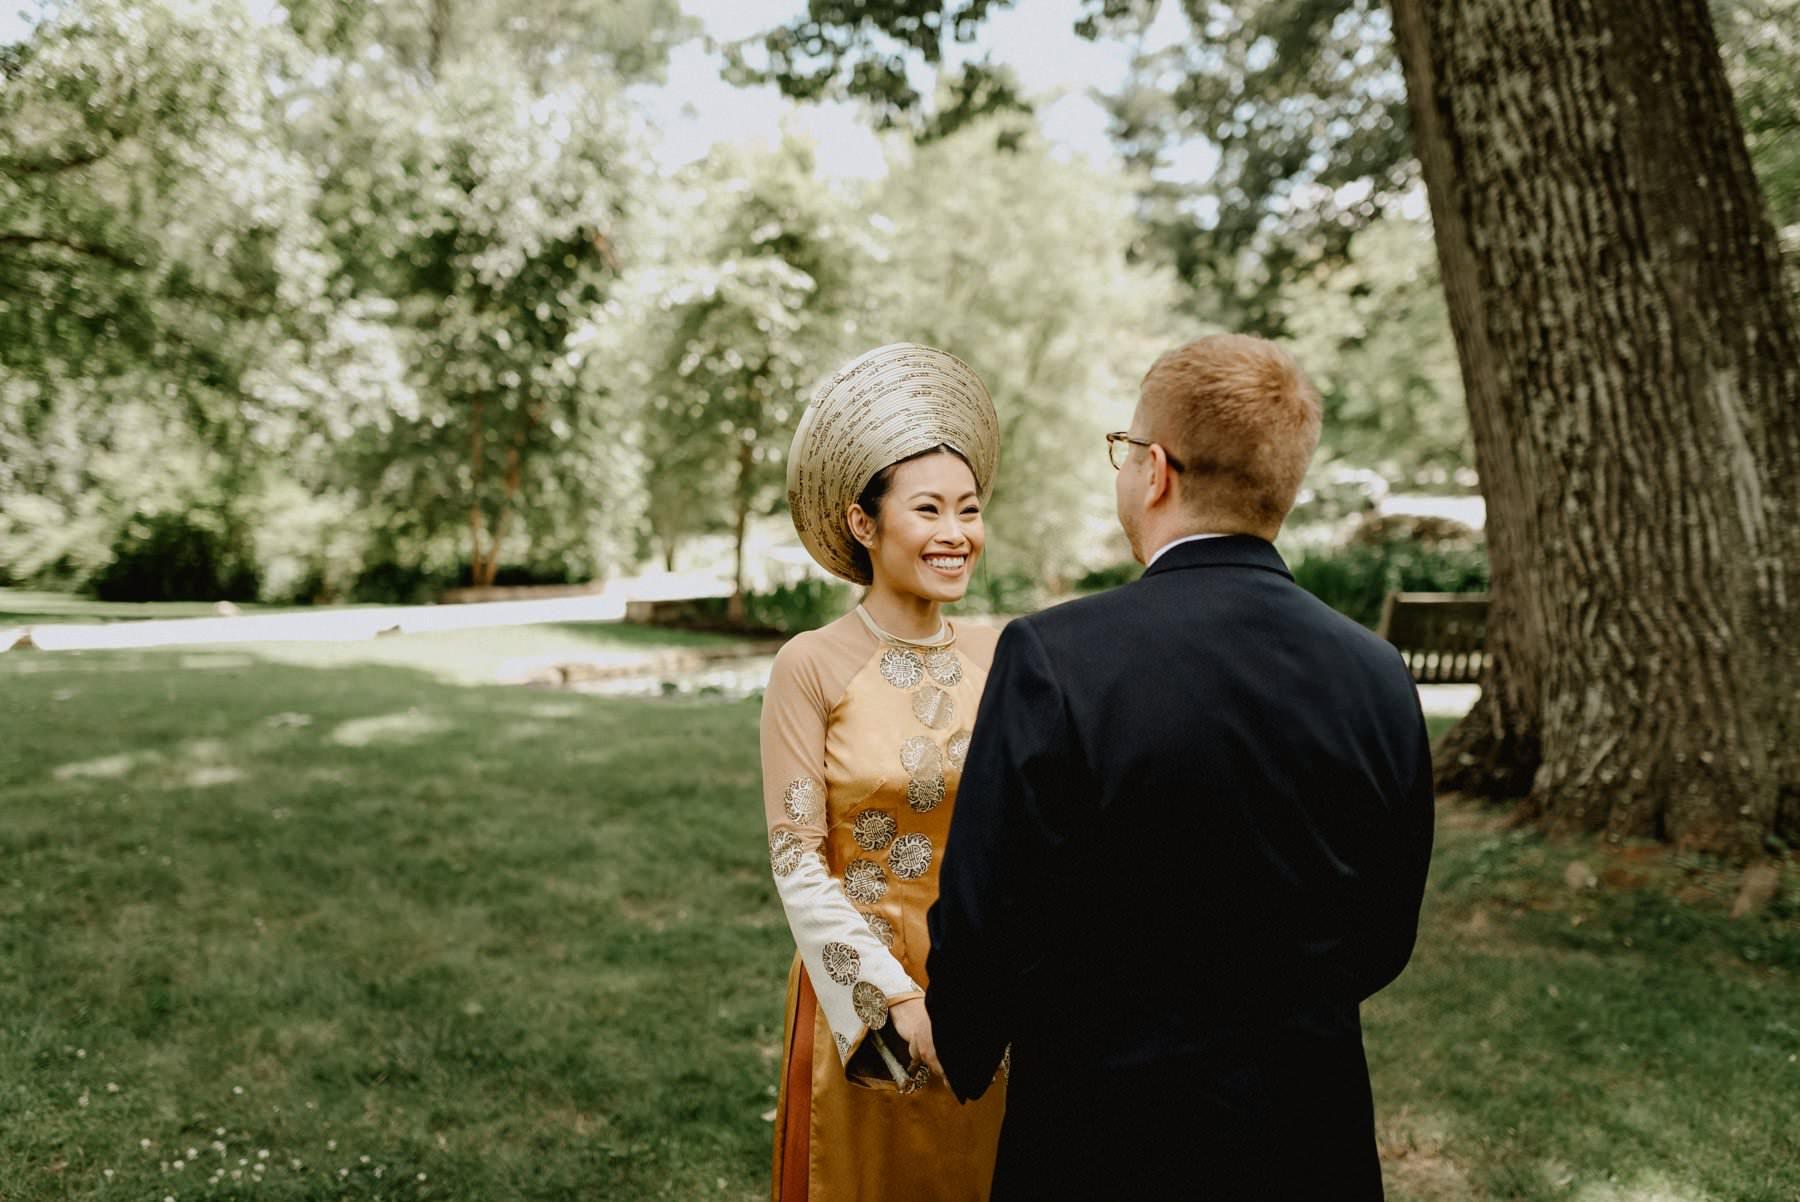 Appleford-estate-wedding-24.jpg